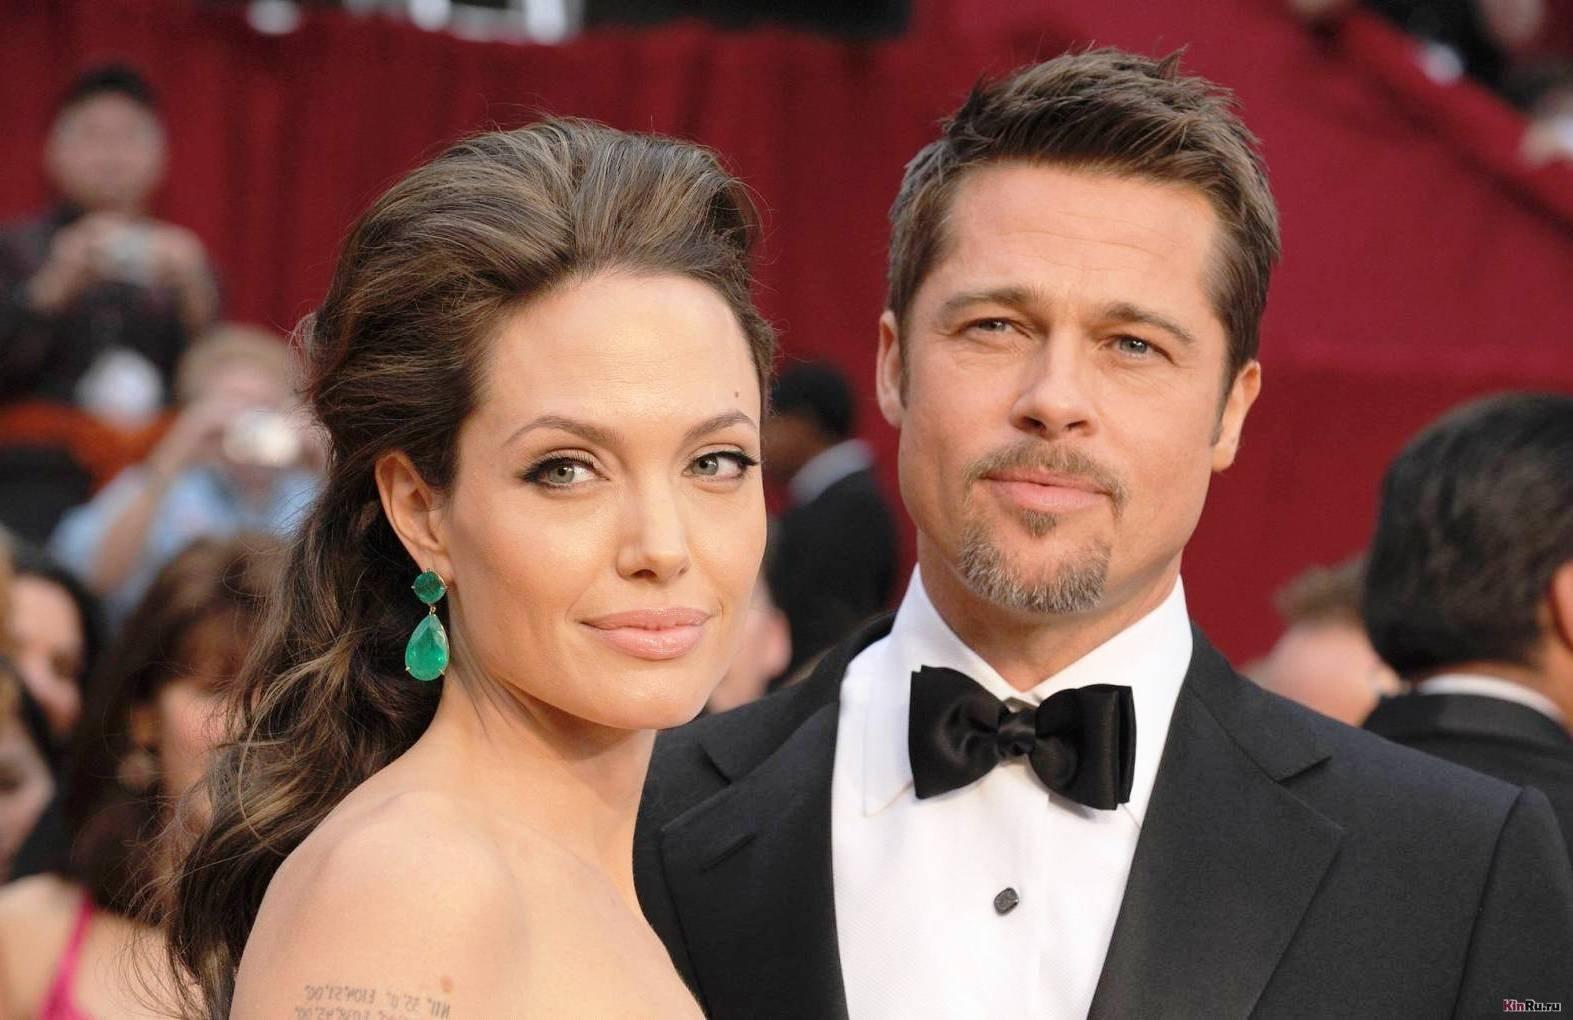 Картинки по запросу Анджелины Джоли и Брэда Питта